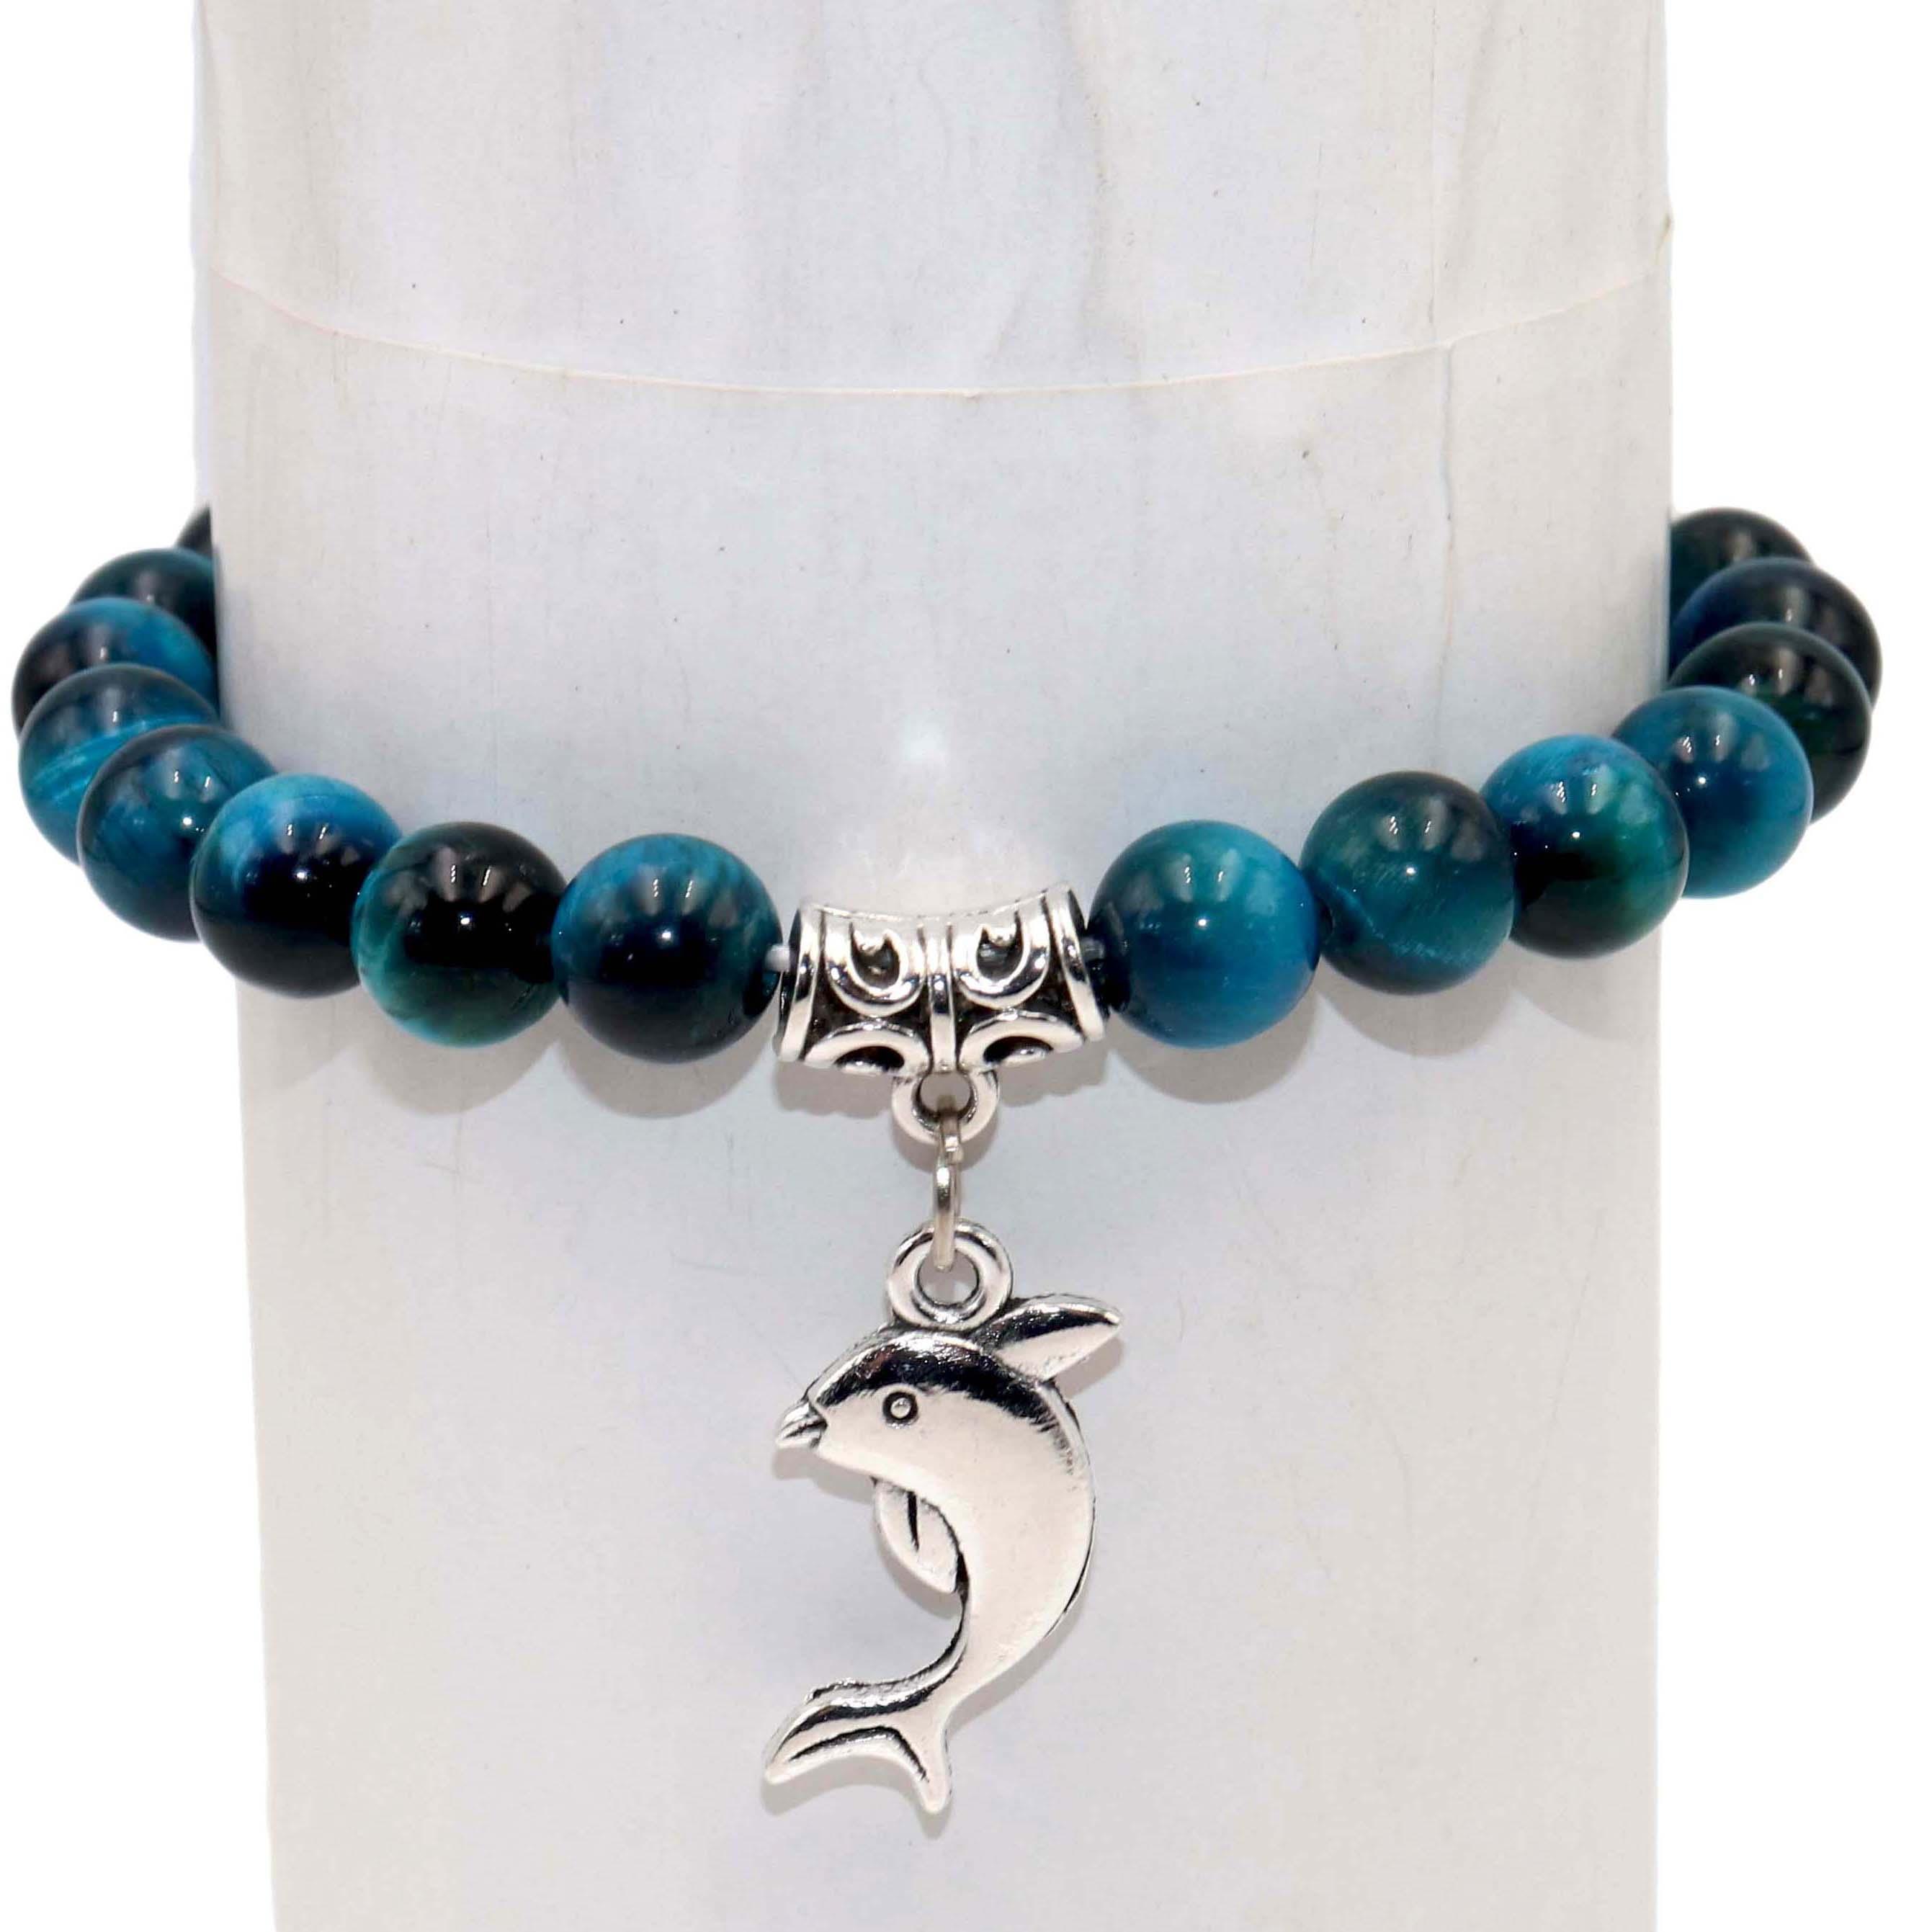 Wholesale Natural Stone Beads Dolphin Tiger Eye Agates Mala Beads Bracelets Bangles Charm For Women Men Yoga Bracelet Femme Gift